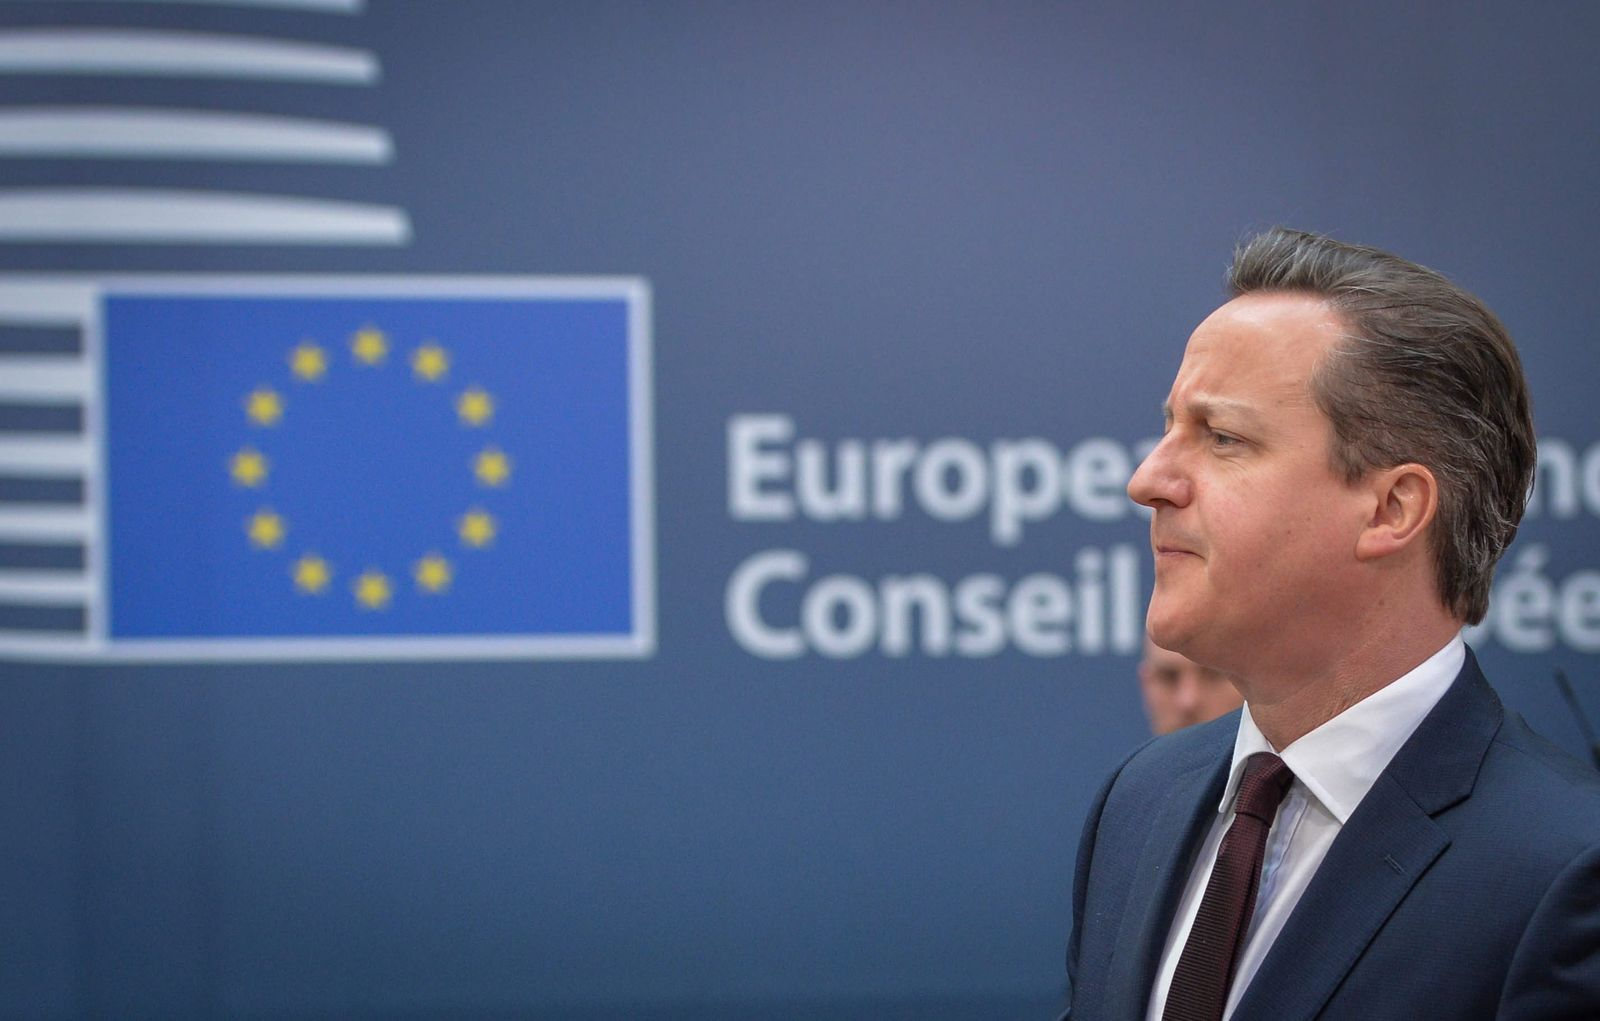 David Cameron/ EU/ Britain